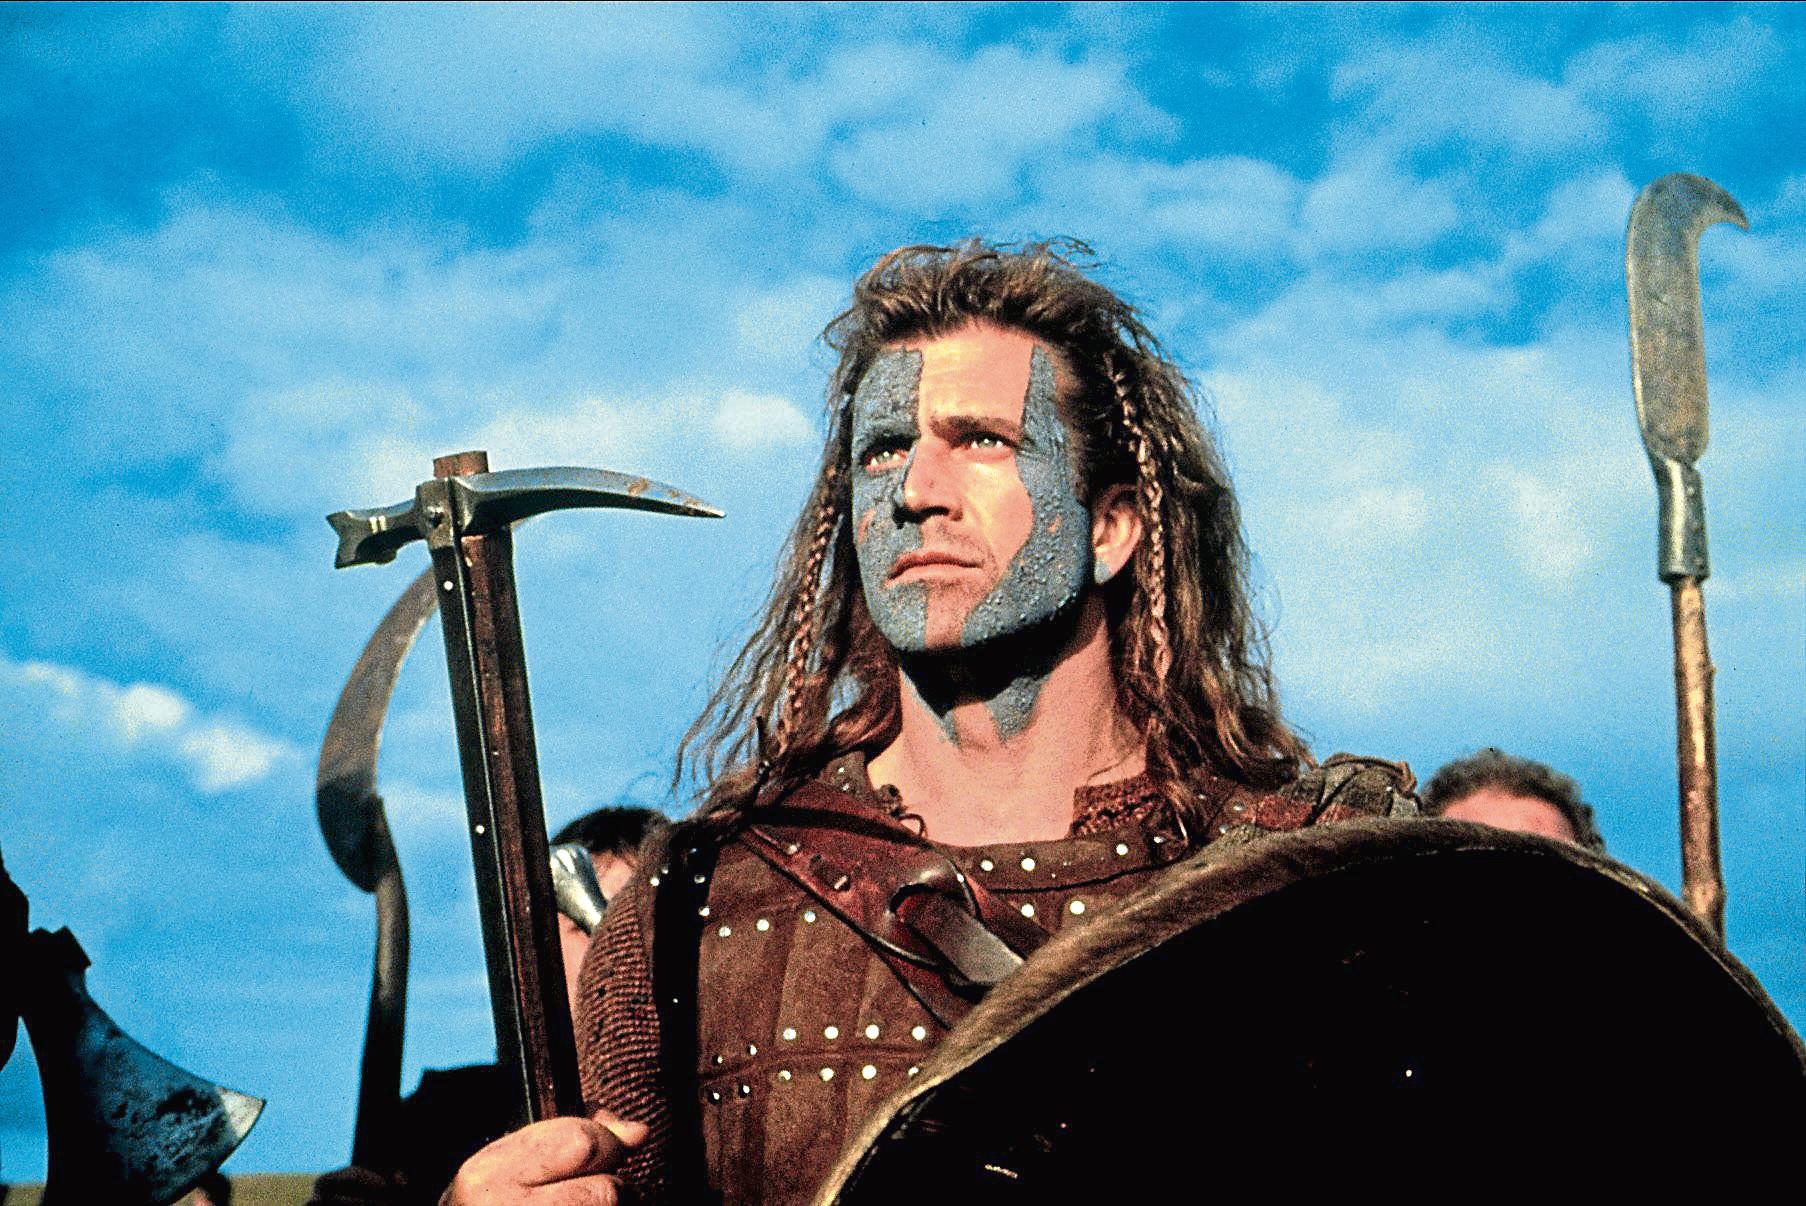 Mel Gibson starred in the award-winning Braveheart.